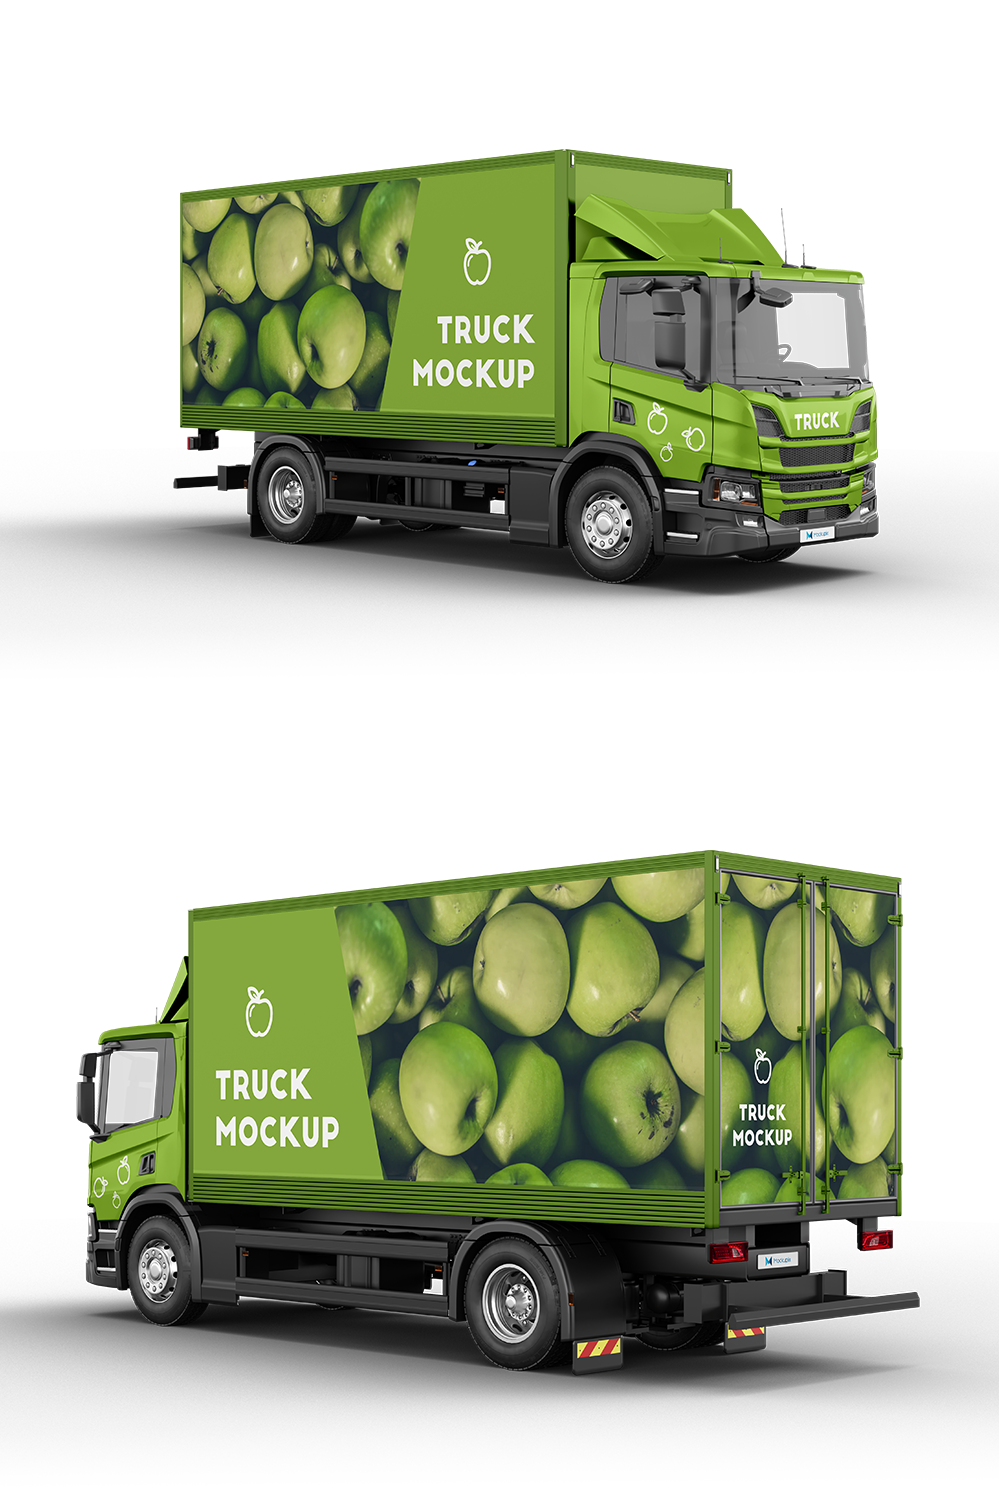 Download Truck Mockup 3 in 2020 | Truck design, Trucks, Mockup